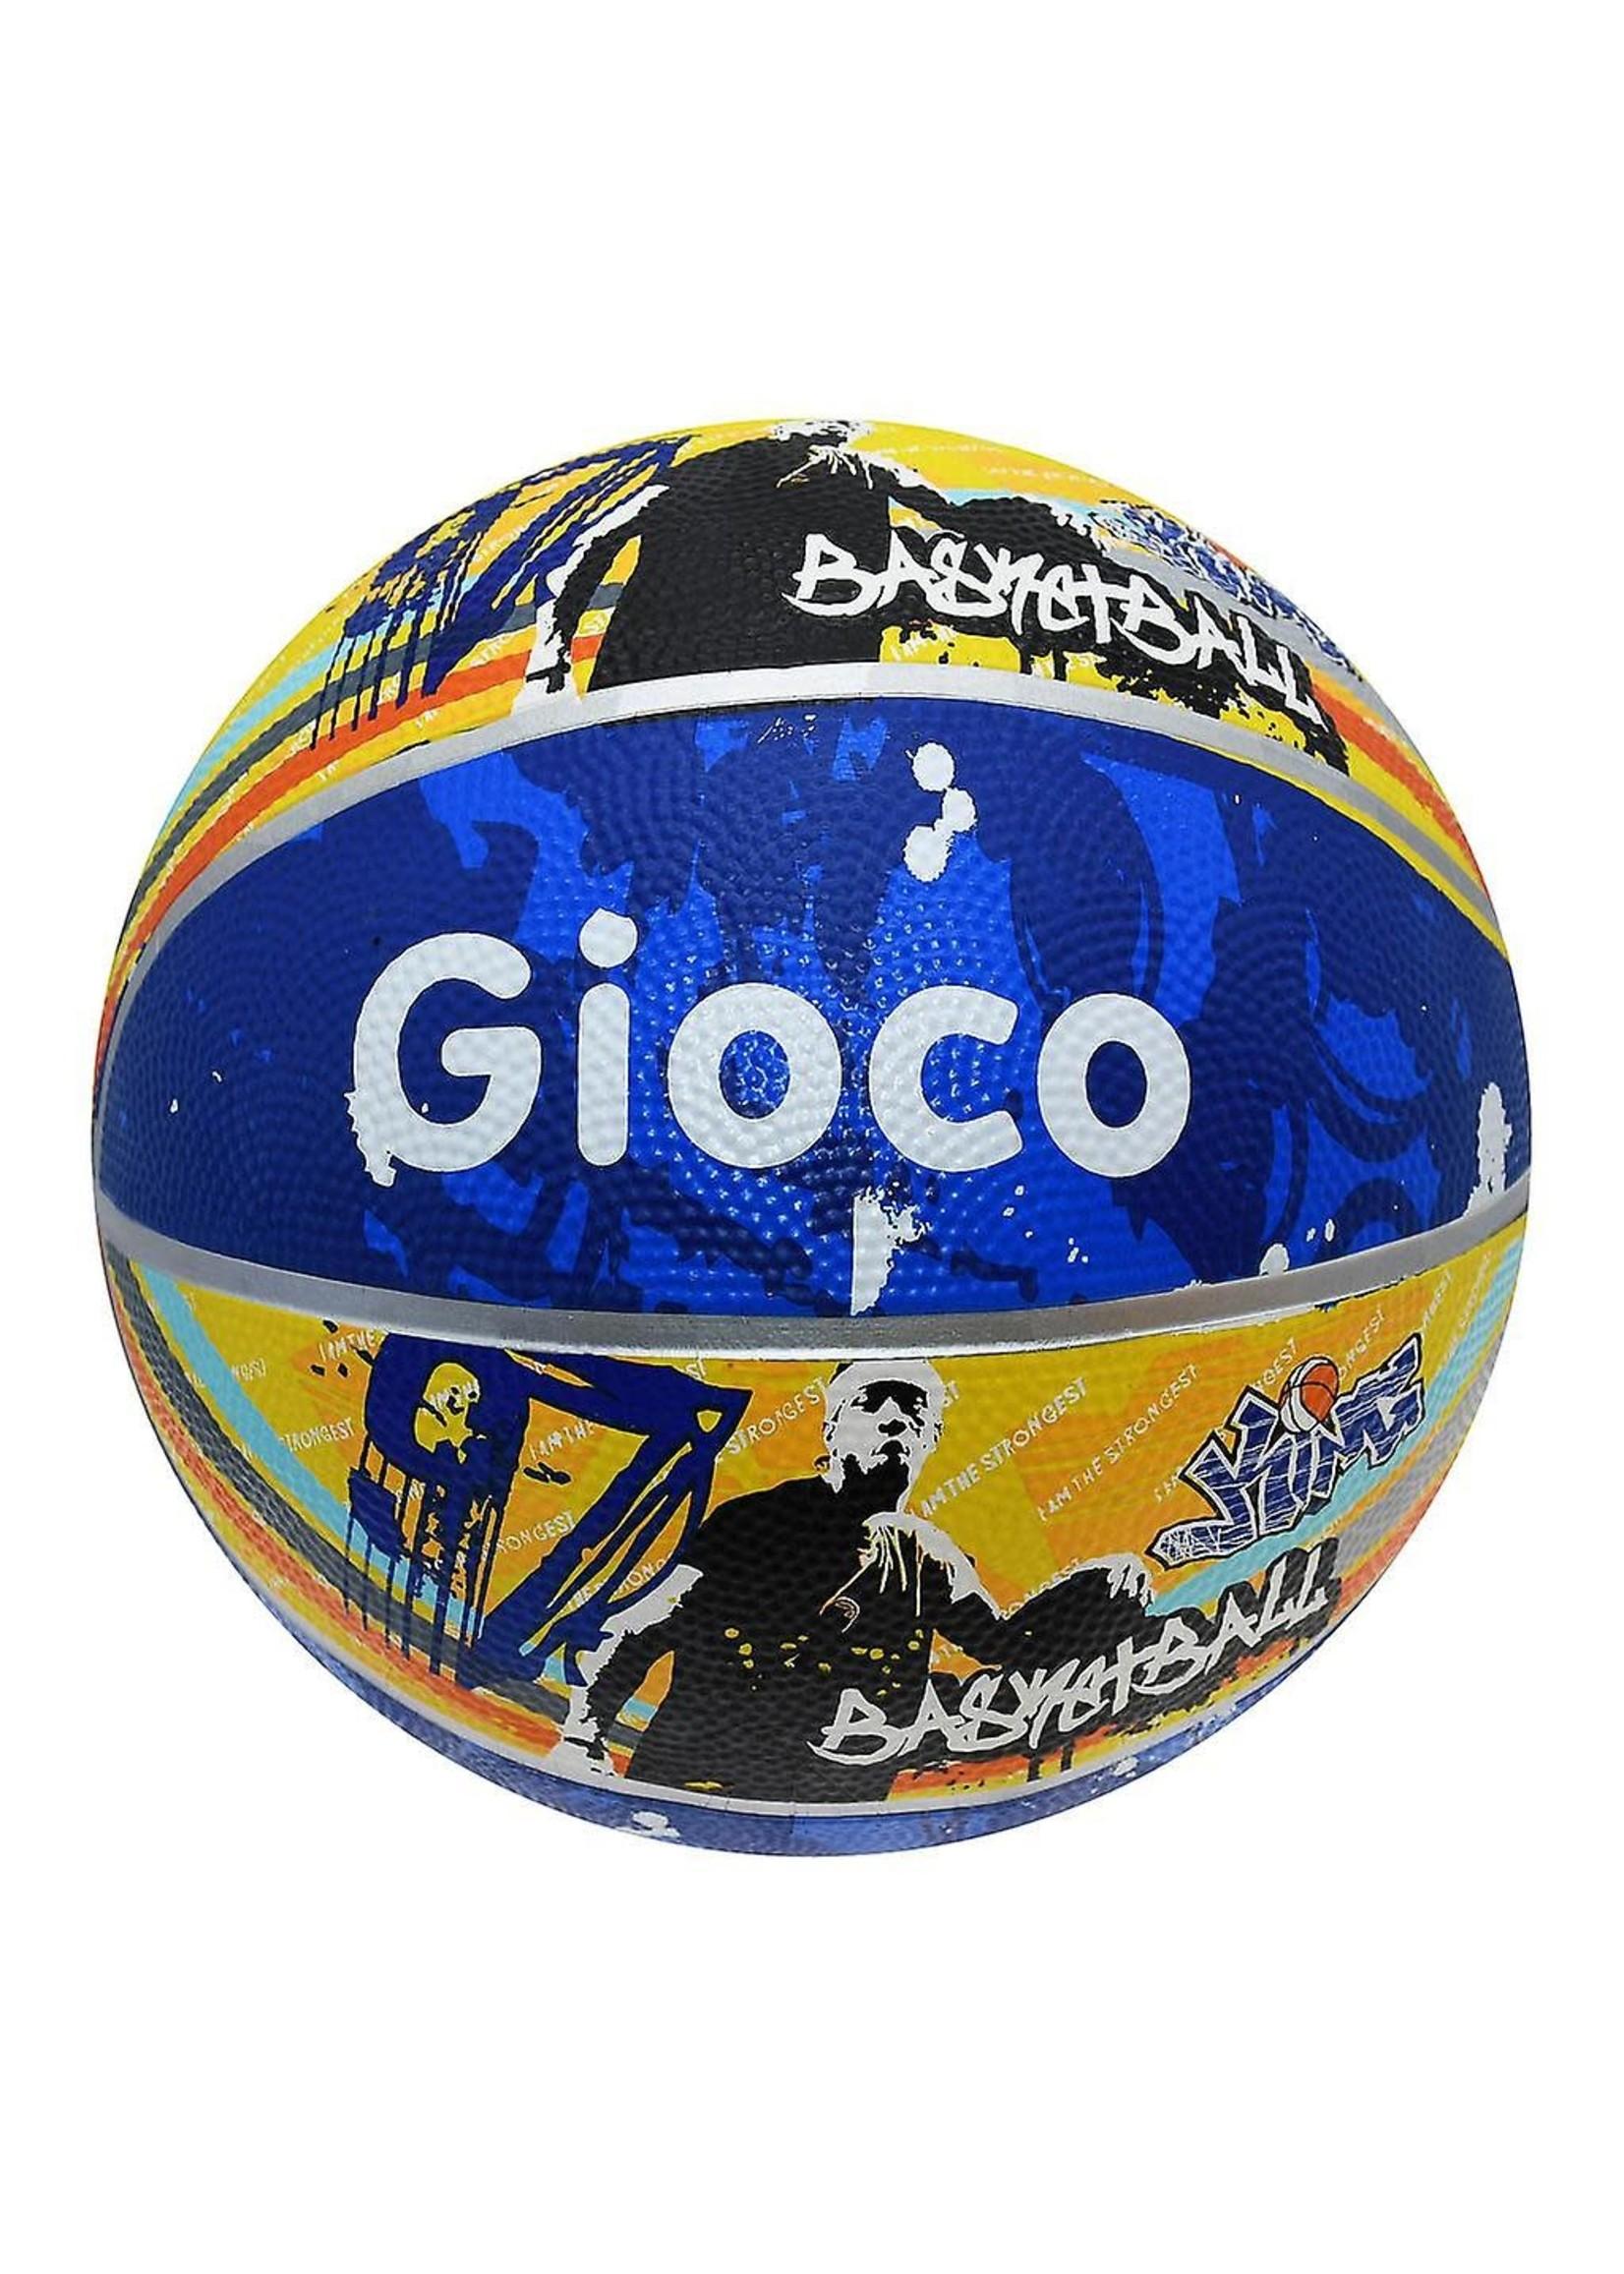 Gioco Street2 Basketball